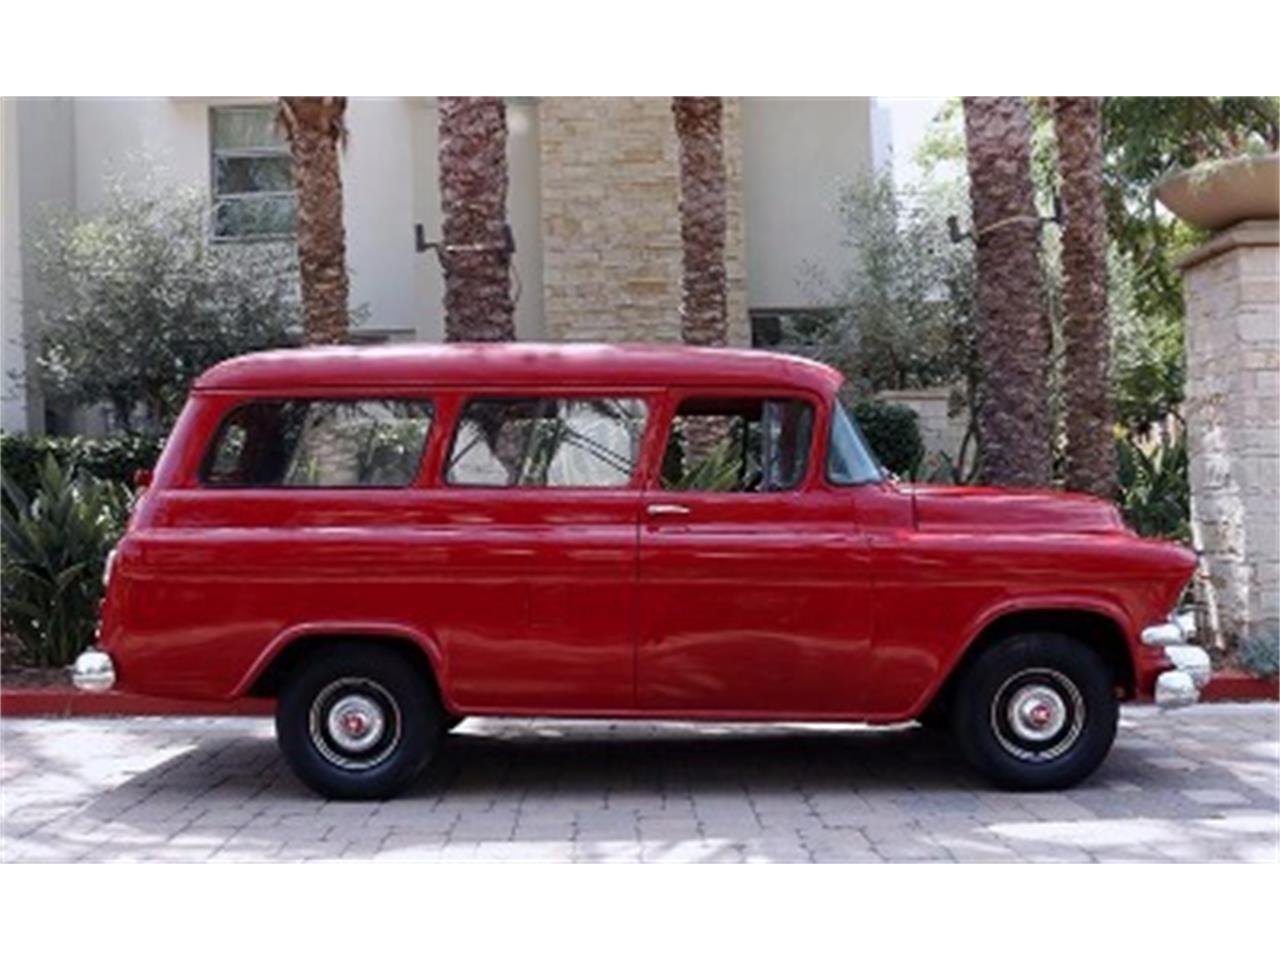 Large Picture of Classic 1956 GMC Suburban located in Mundelein Illinois - $34,900.00 - NOWV